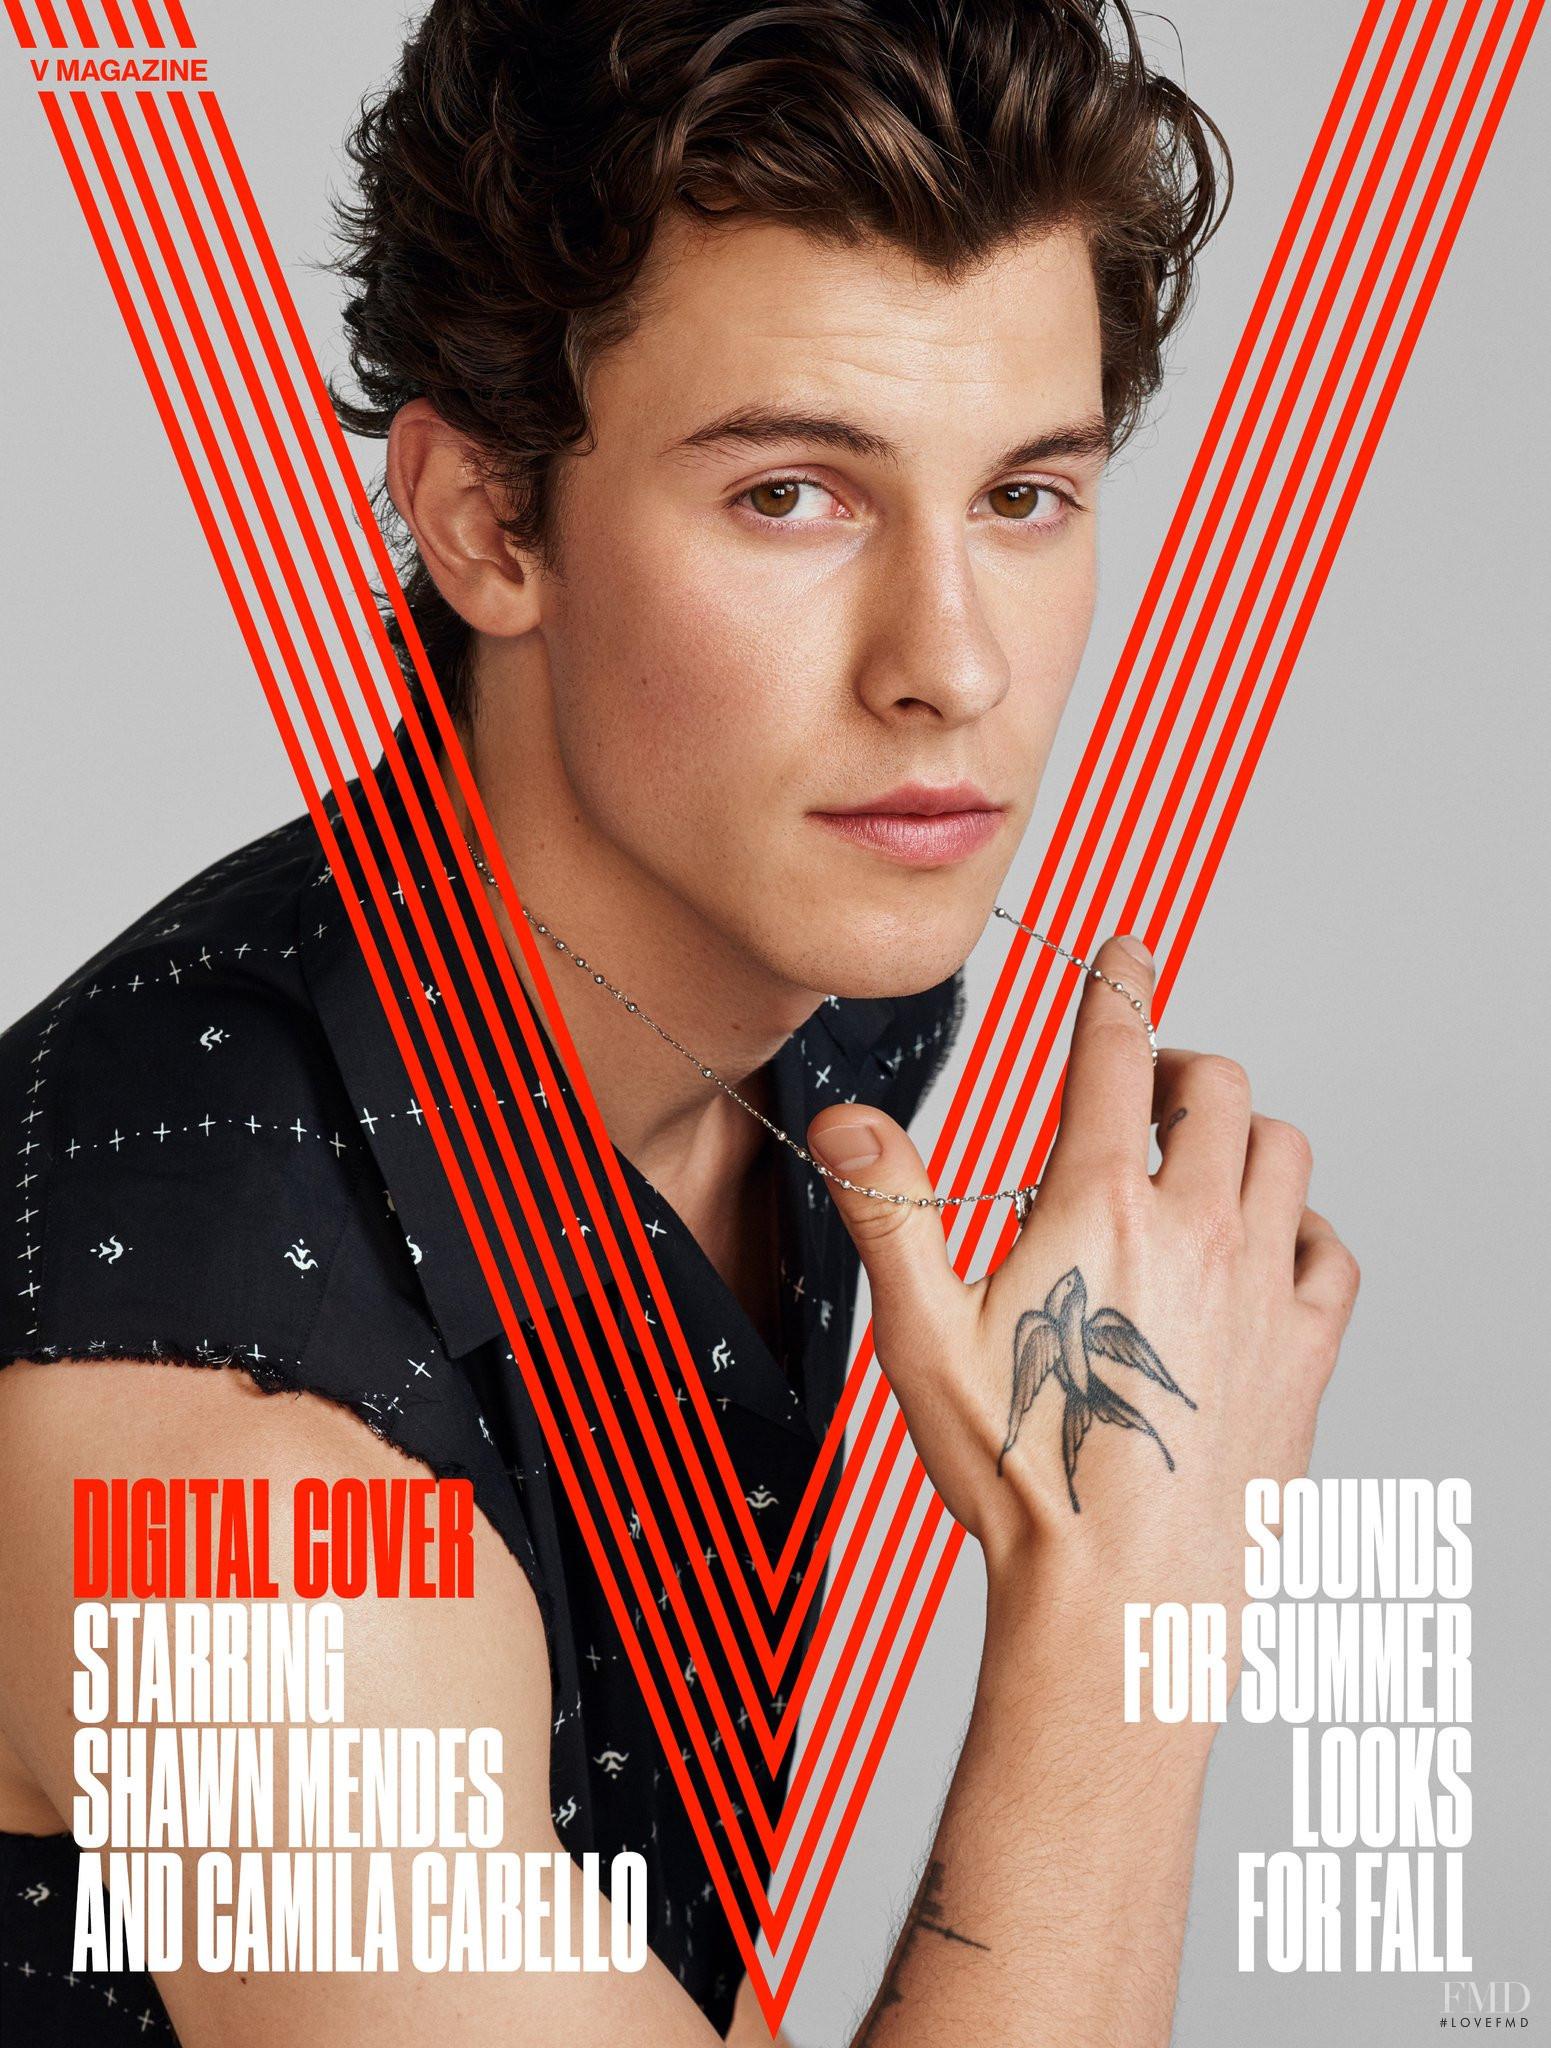 v-magazine-2019-july-04-fullsize.jpg